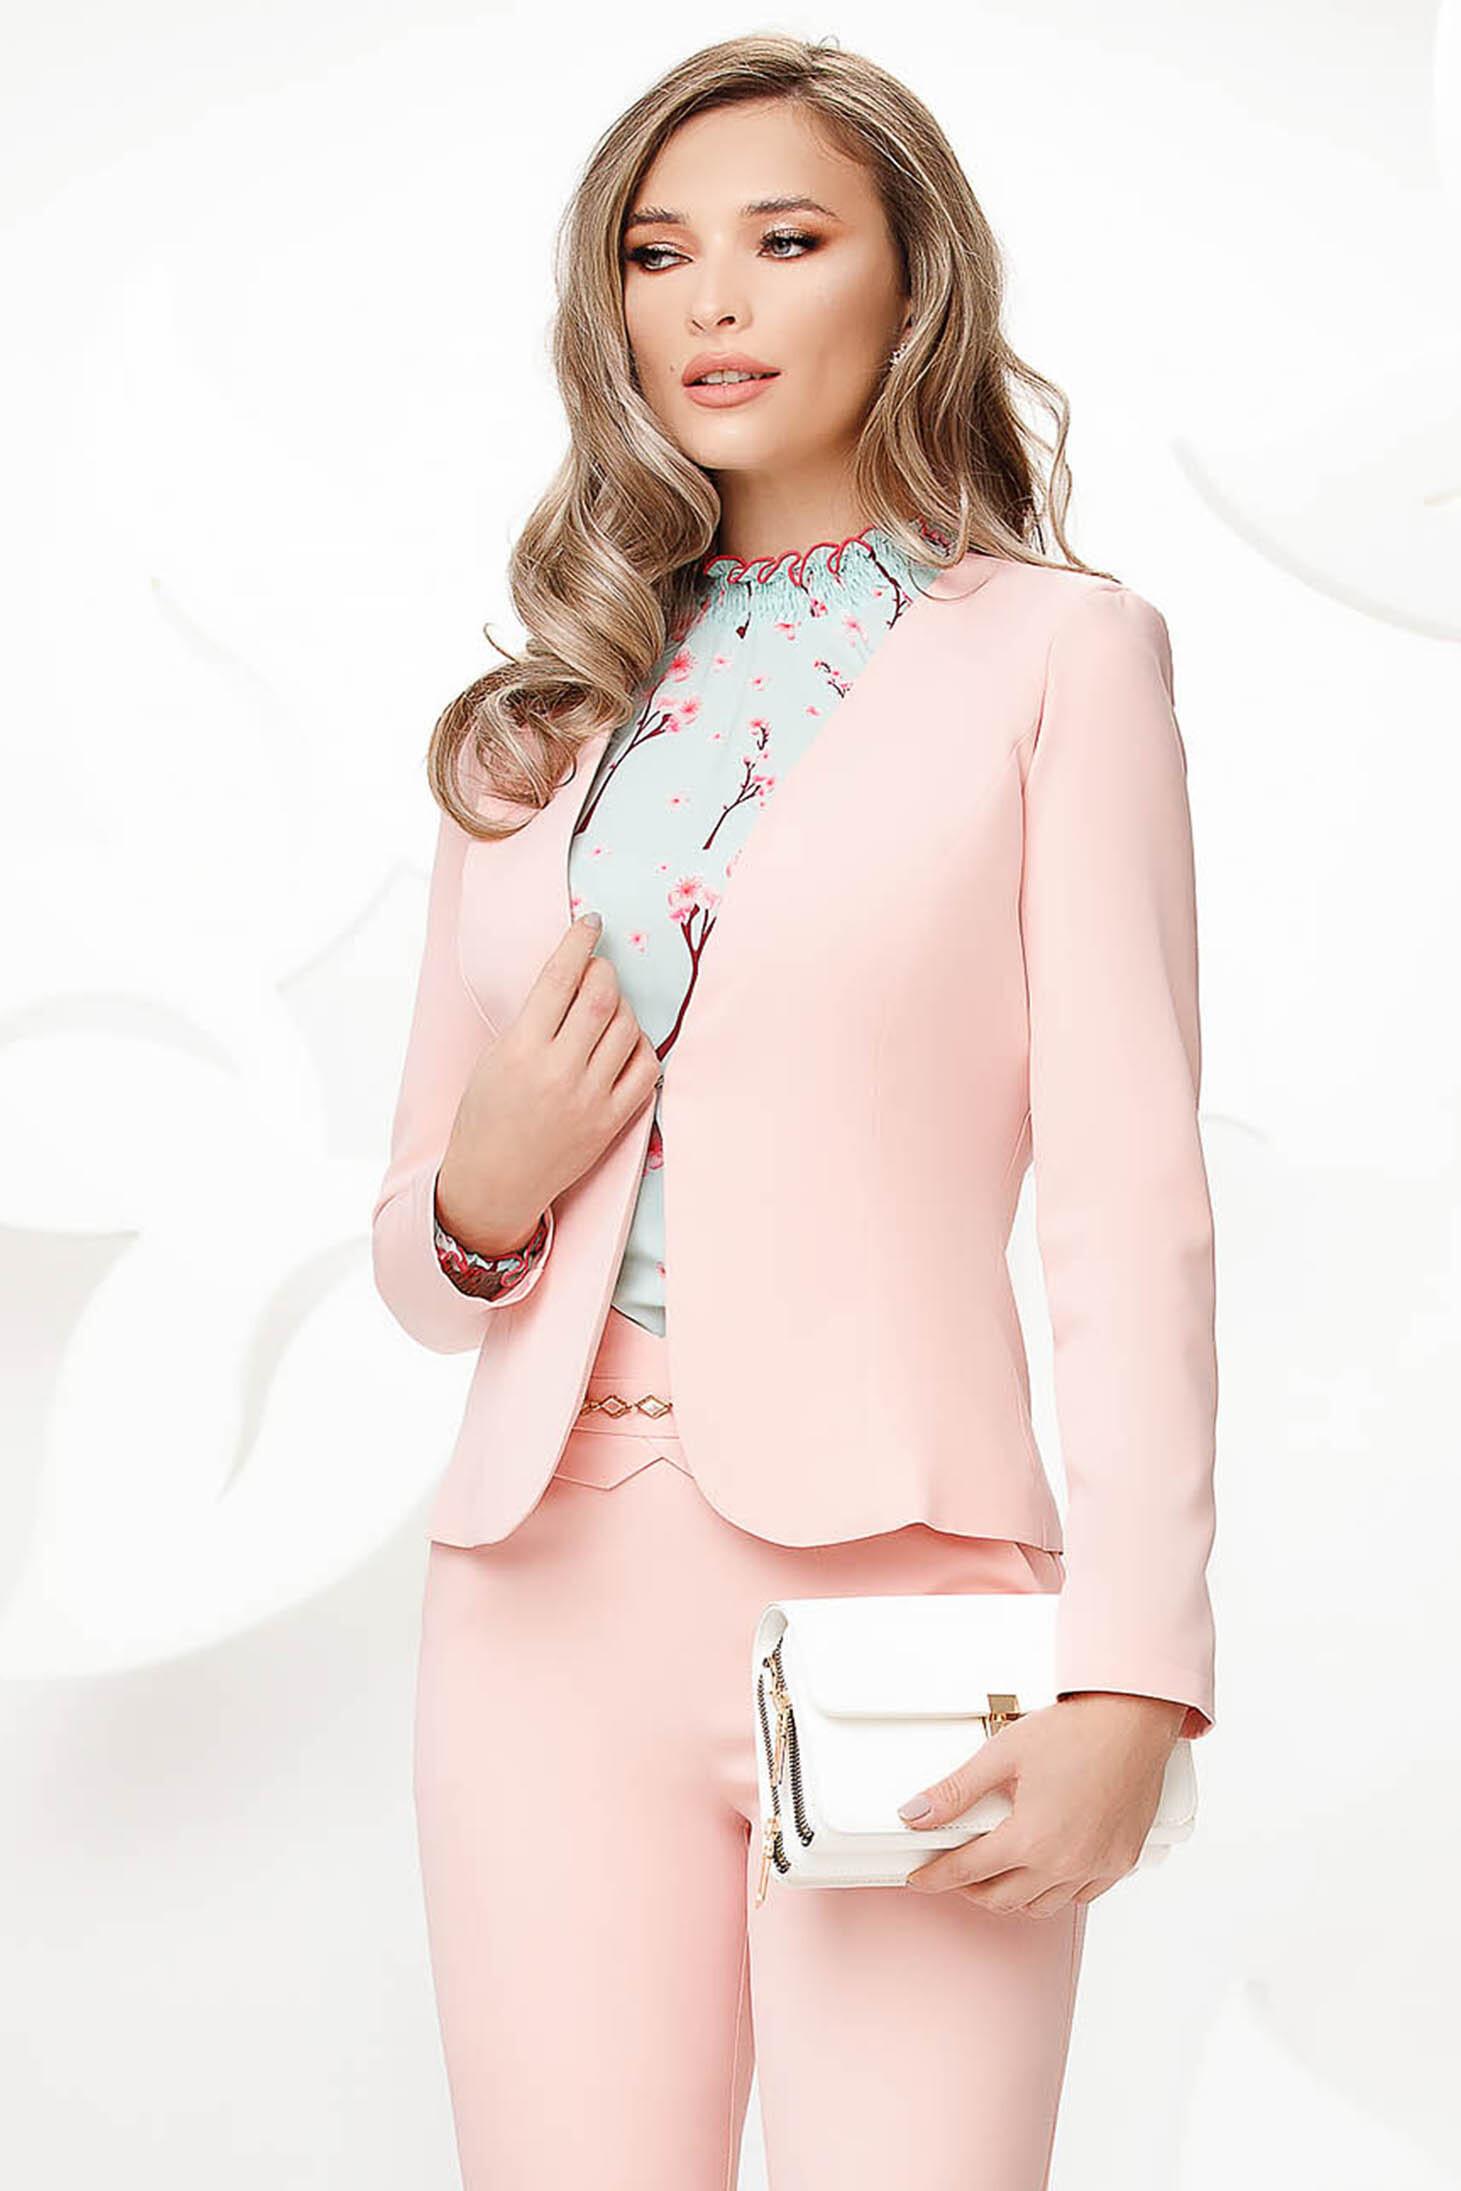 Sacou Fofy roz deschis office cambrat din stofa usor elastica cu umerii buretati